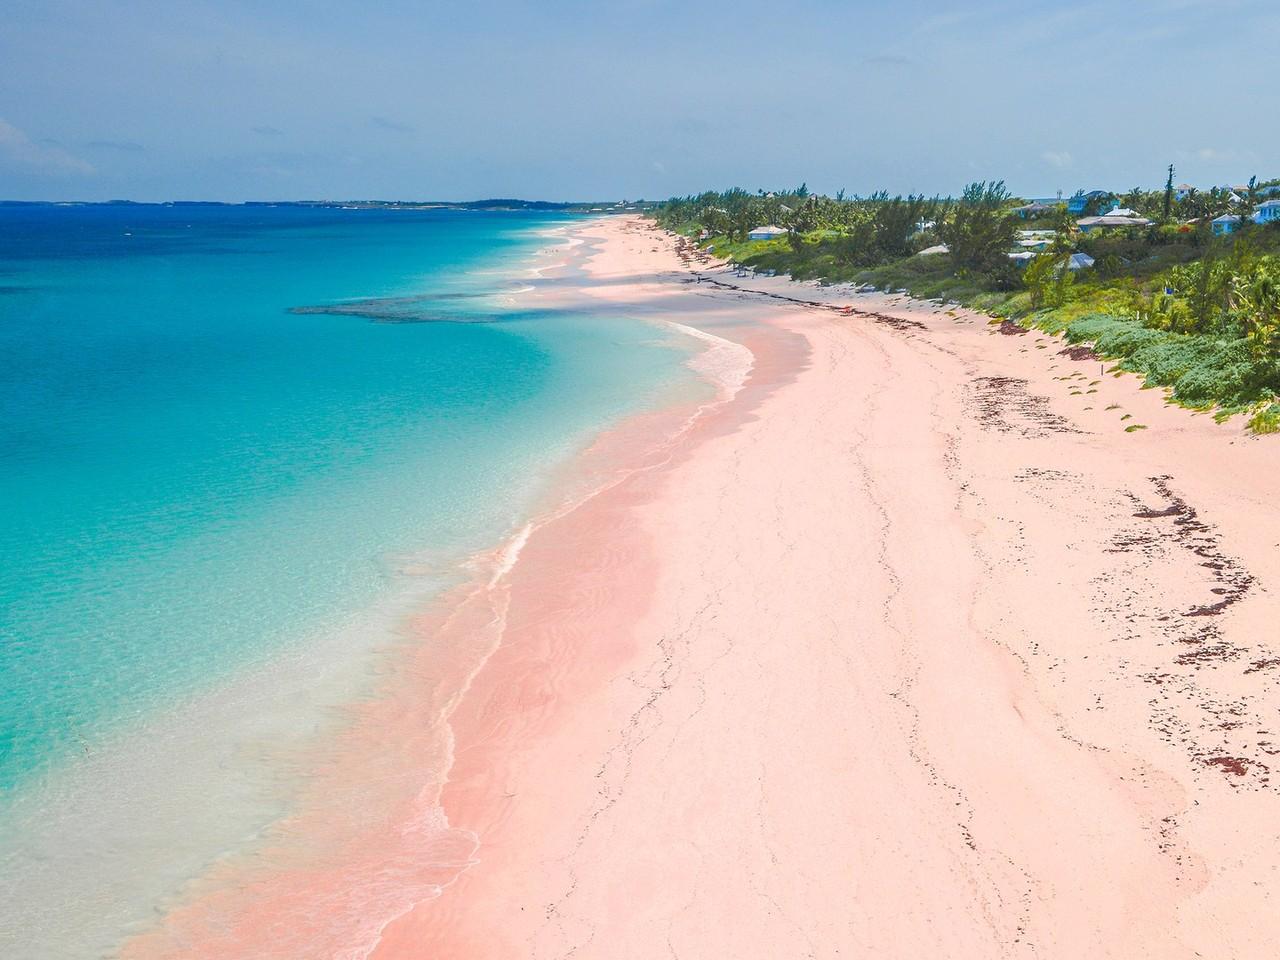 pink-beaches-harbor-island-cr-getty-548295287.jpg